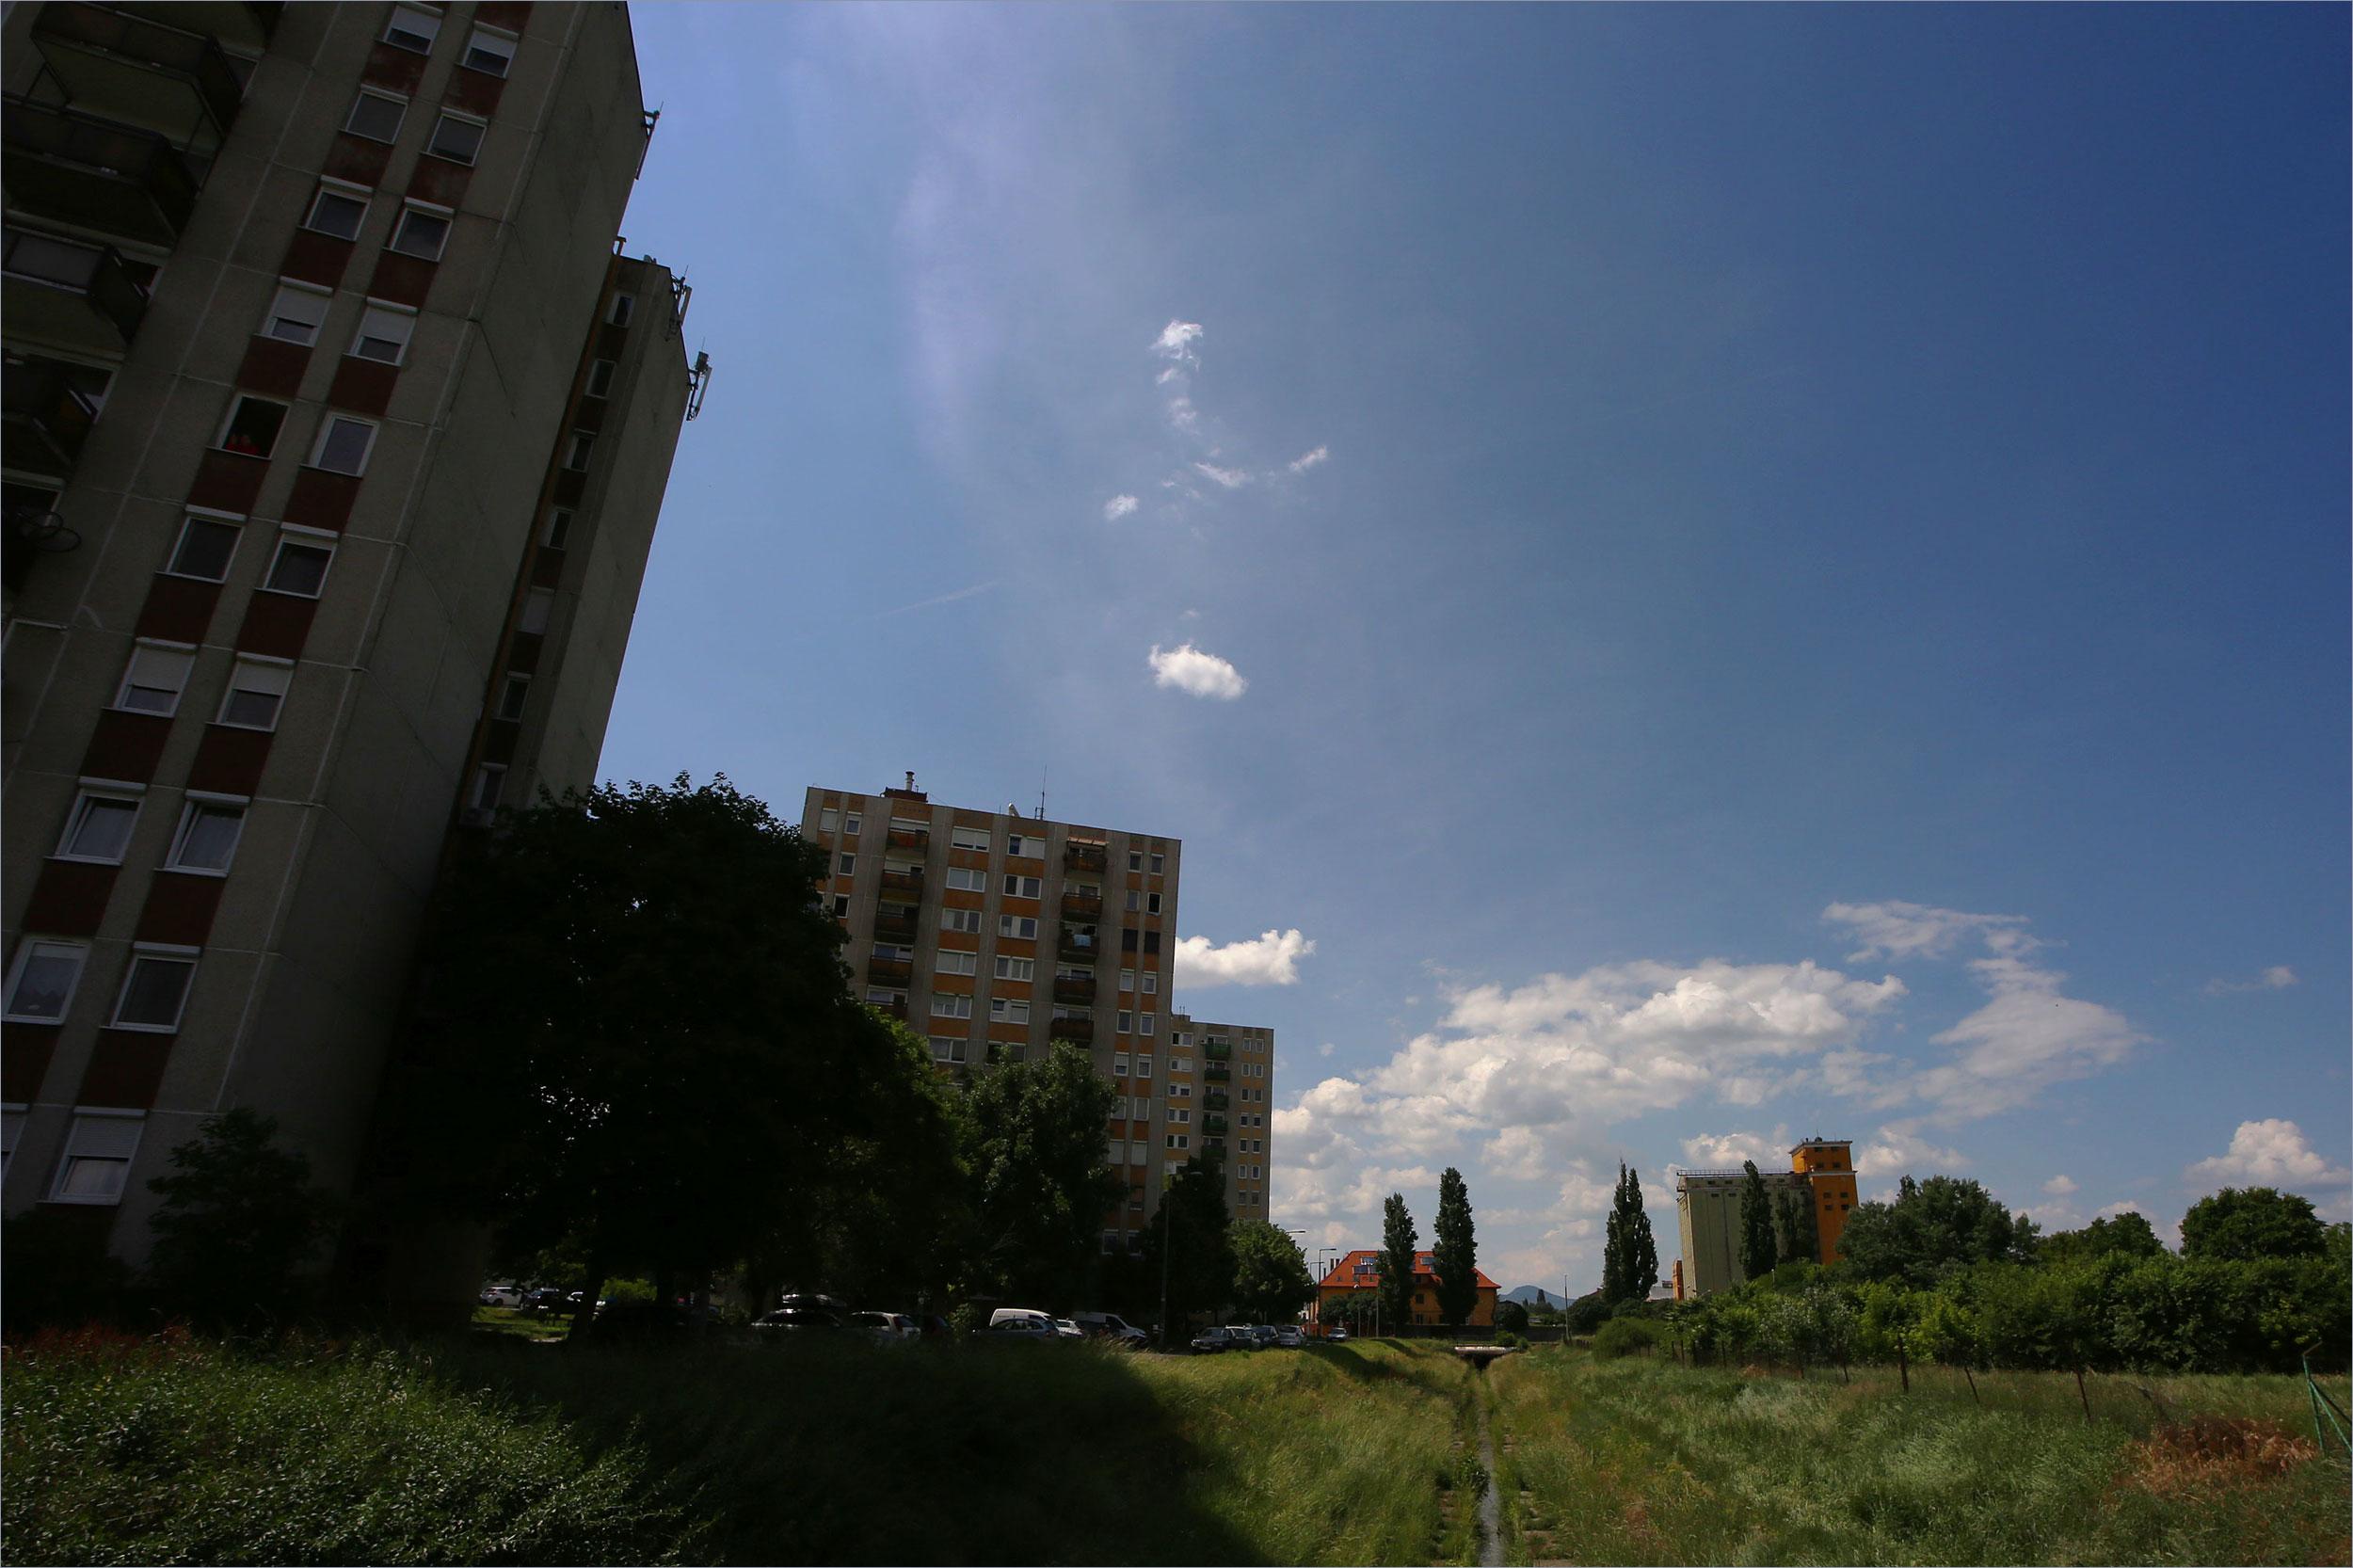 k714.jpg